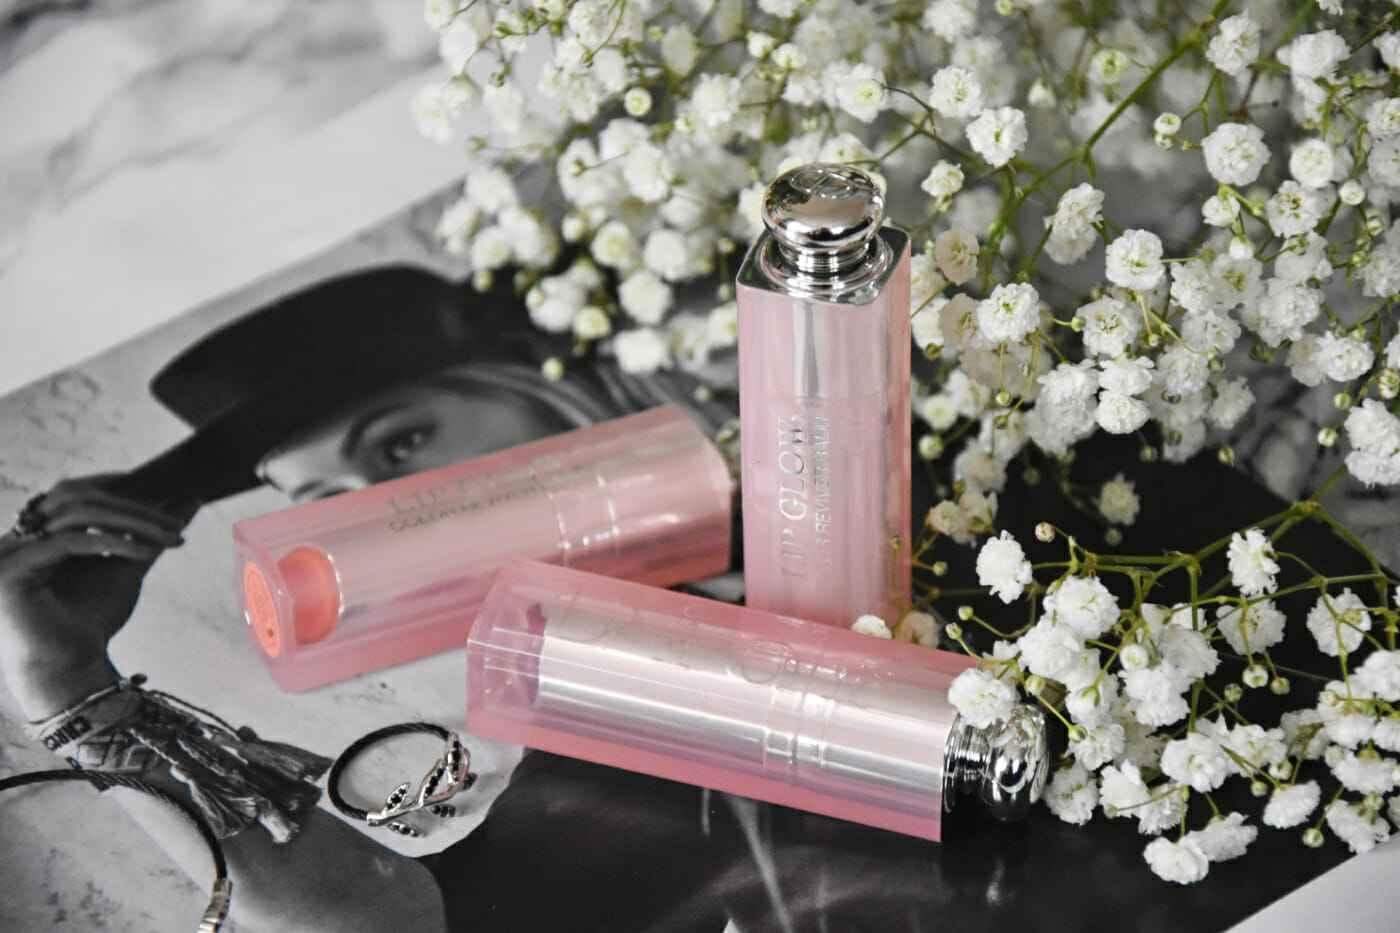 Dior LipGlow 1